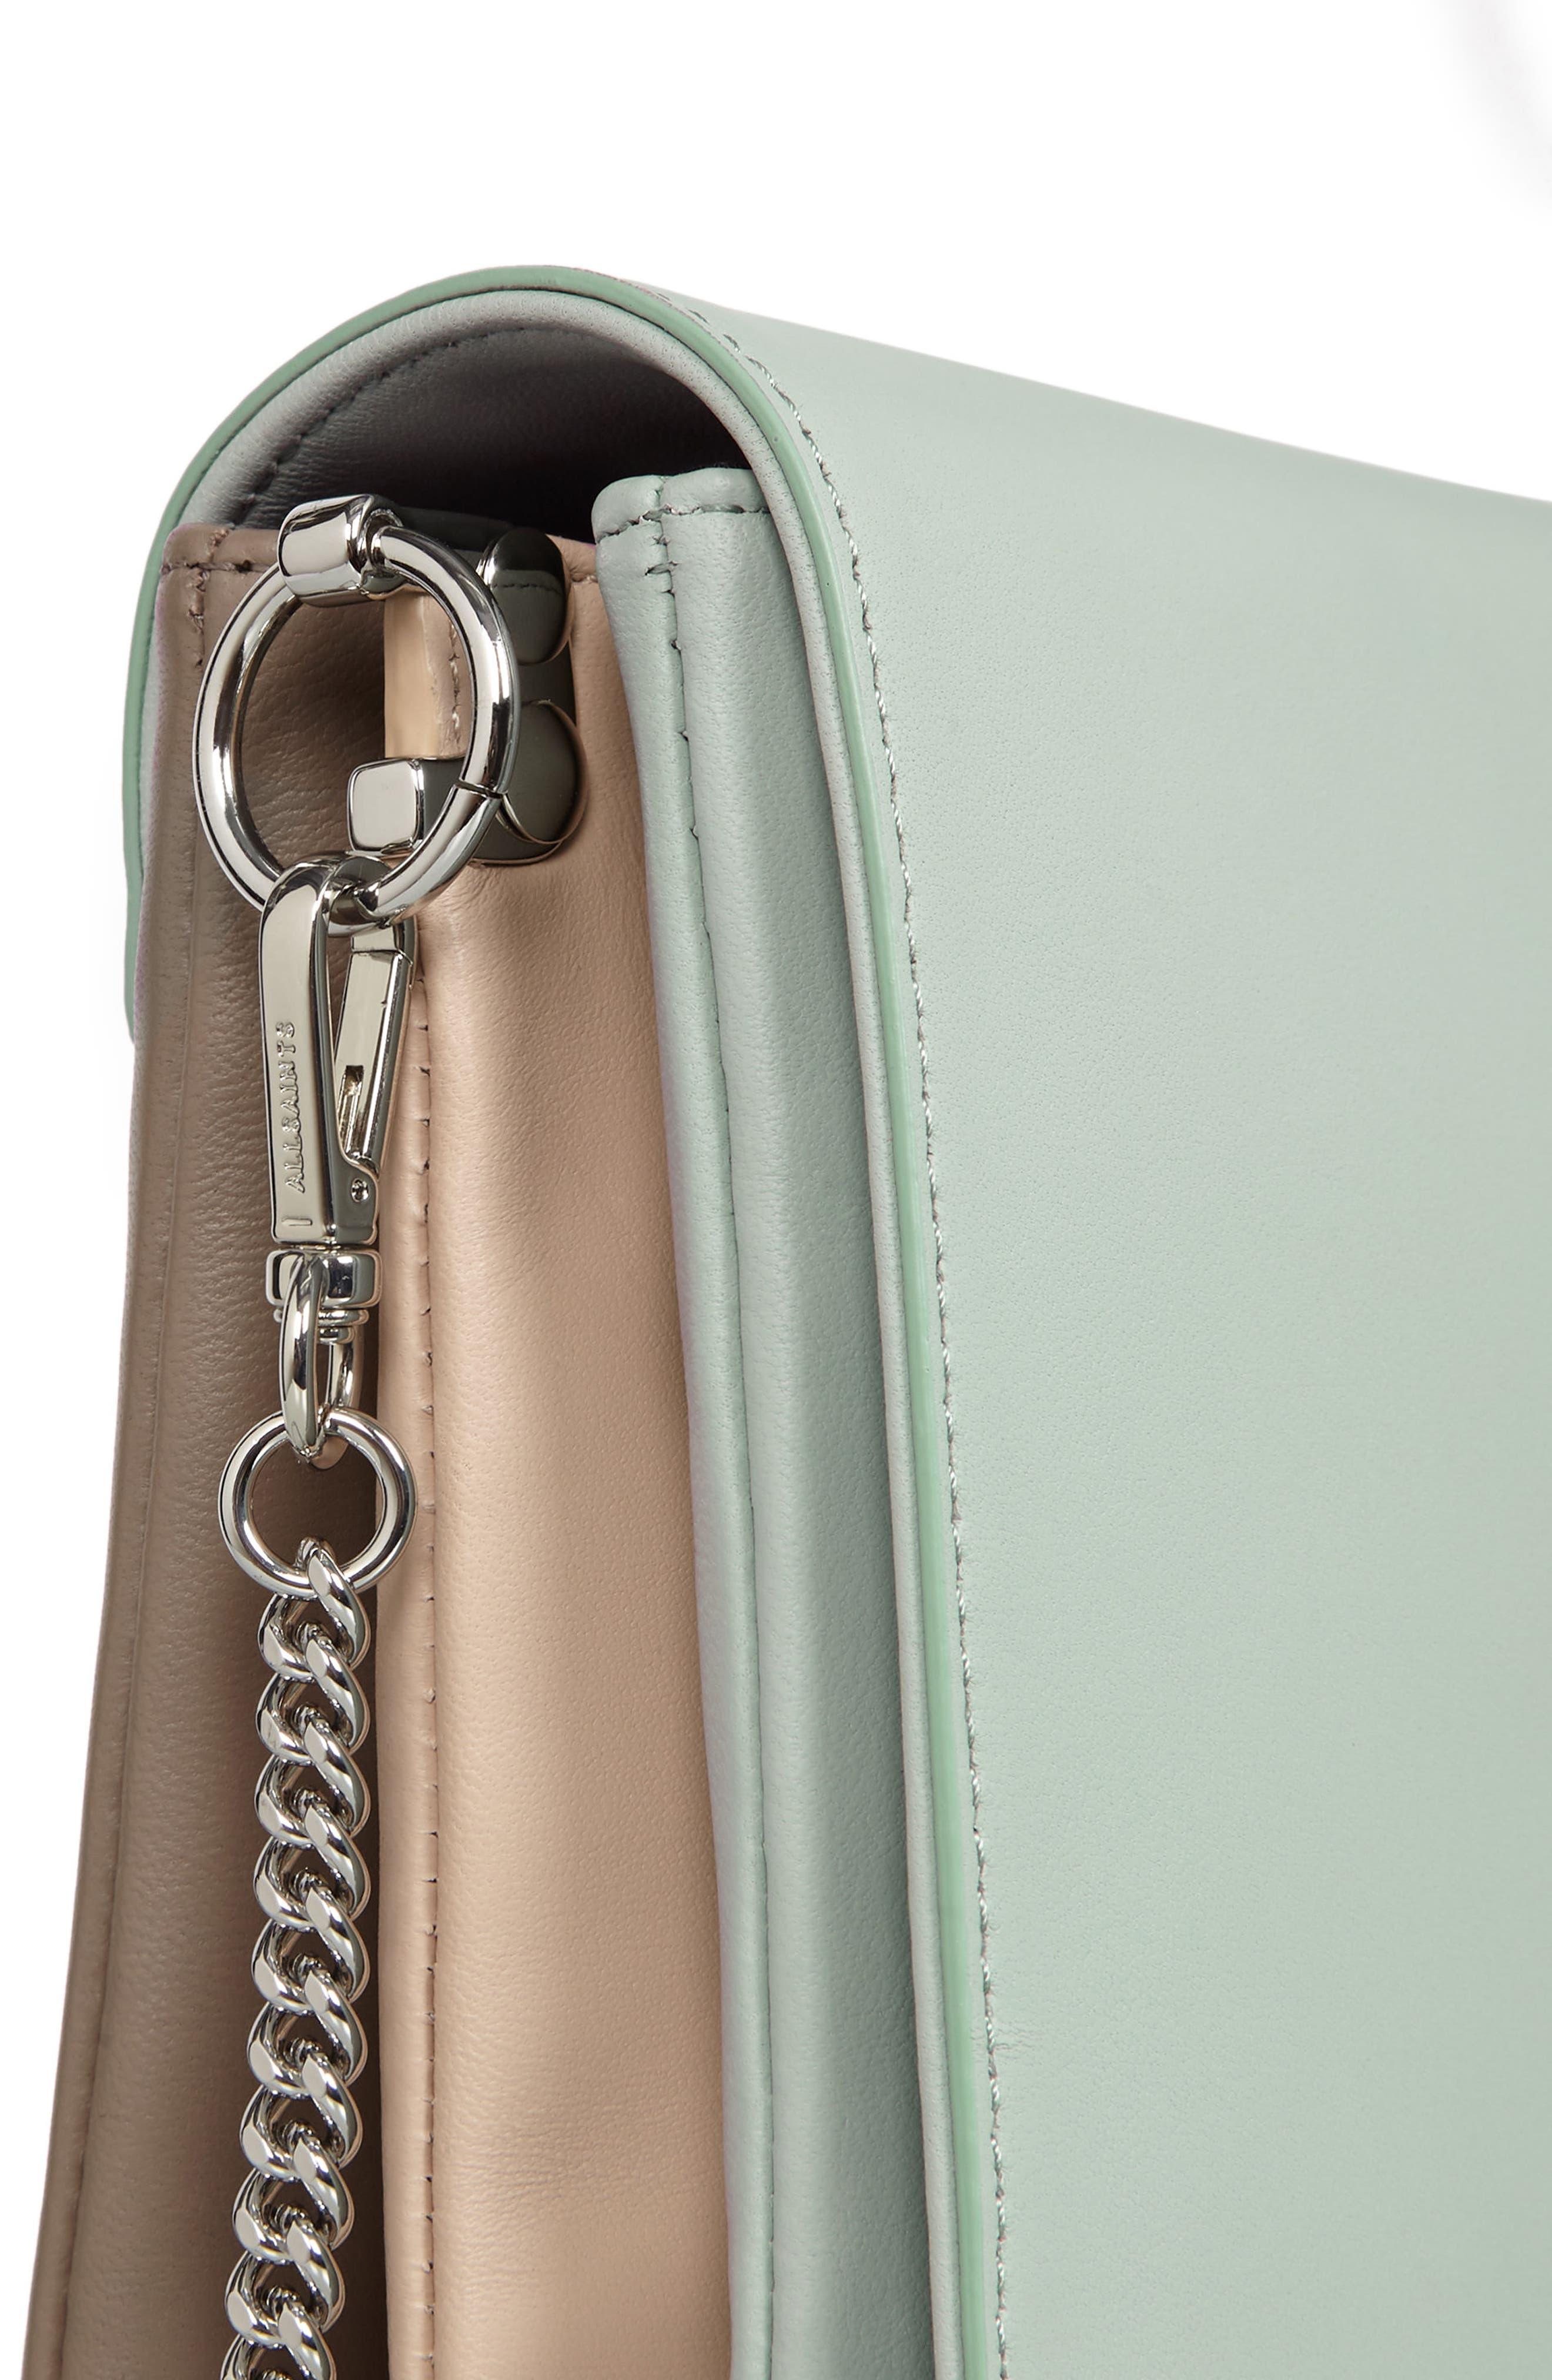 Zep Colorblock Leather Shoulder Bag,                             Alternate thumbnail 4, color,                             MINT GREEN